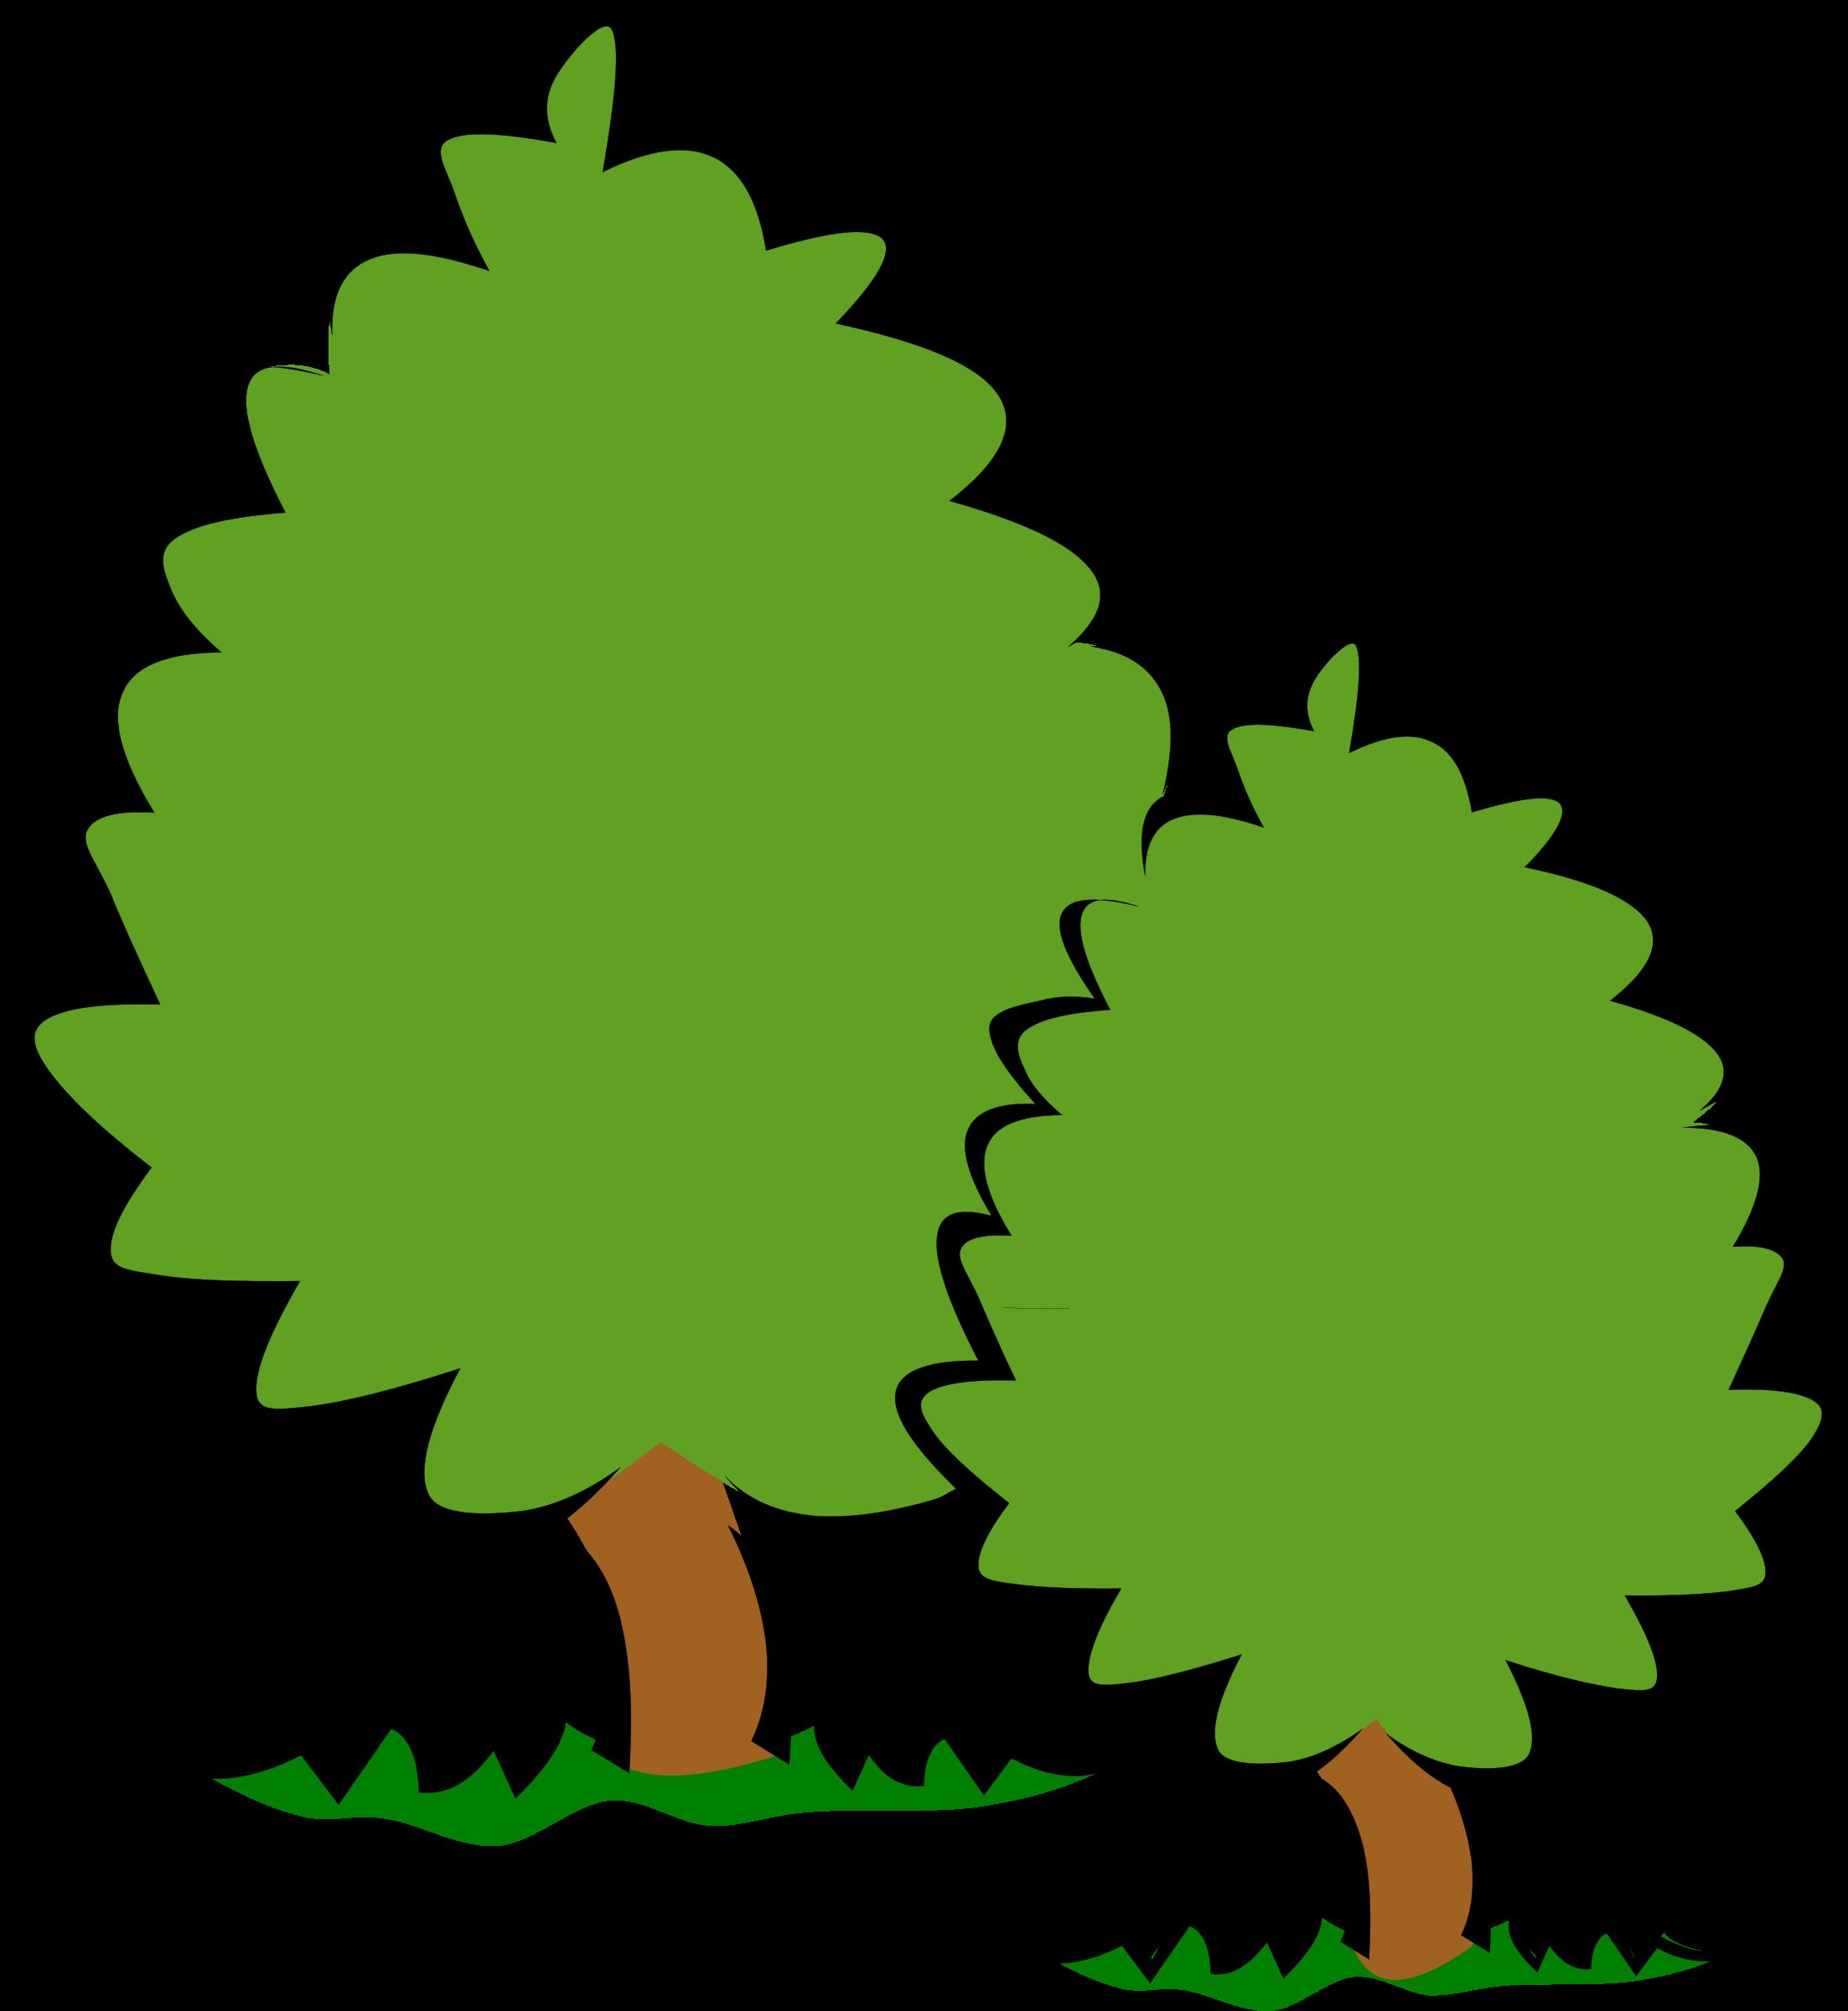 Trees bushes image png. Big clipart big small